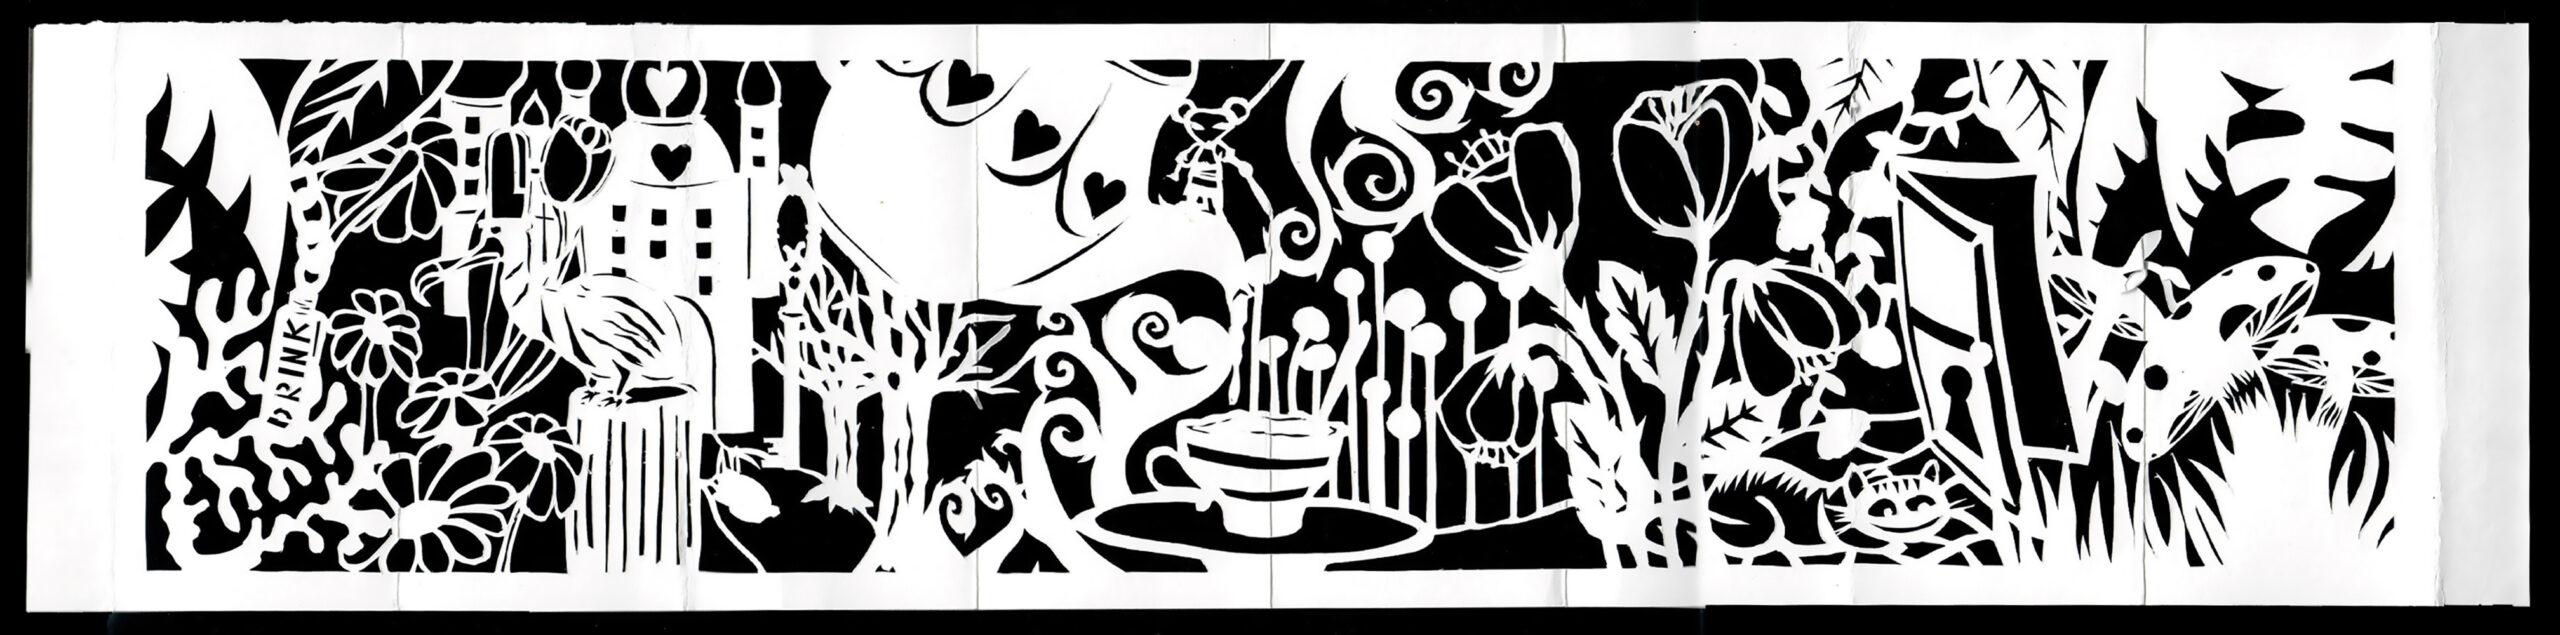 Studiocooliejoelie-papiersnijkunst-karinmol-verhaal-doosje-boekje